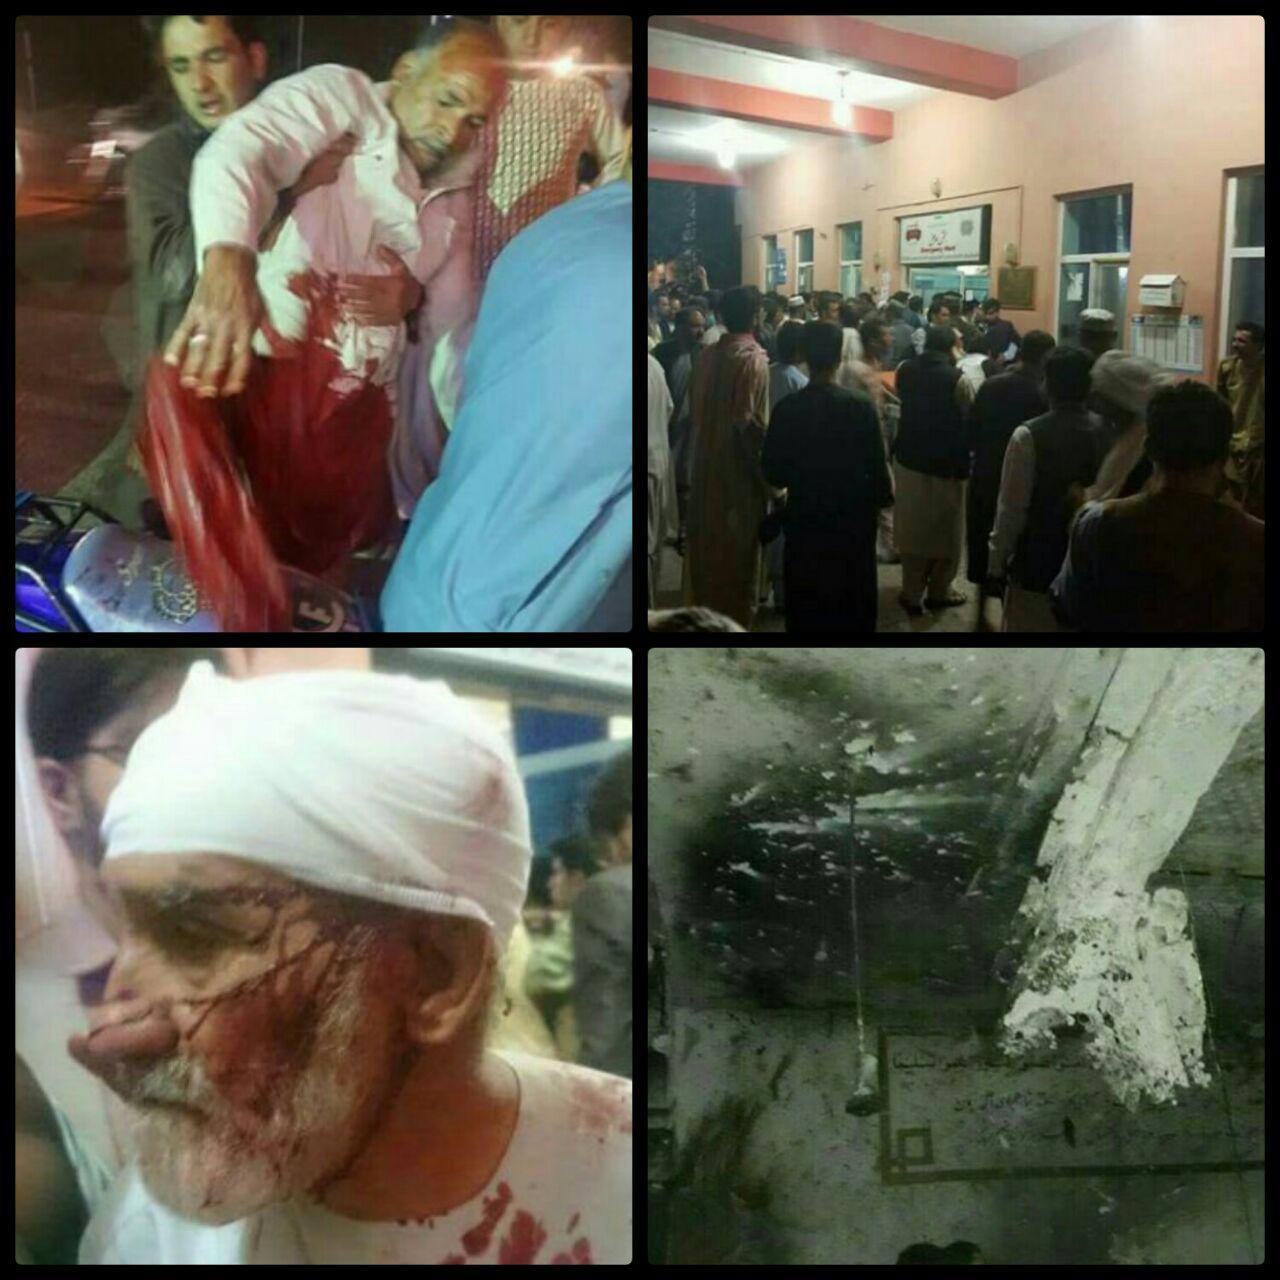 20 کشته در انفجار شهر هرات افغانستان (+عکس)